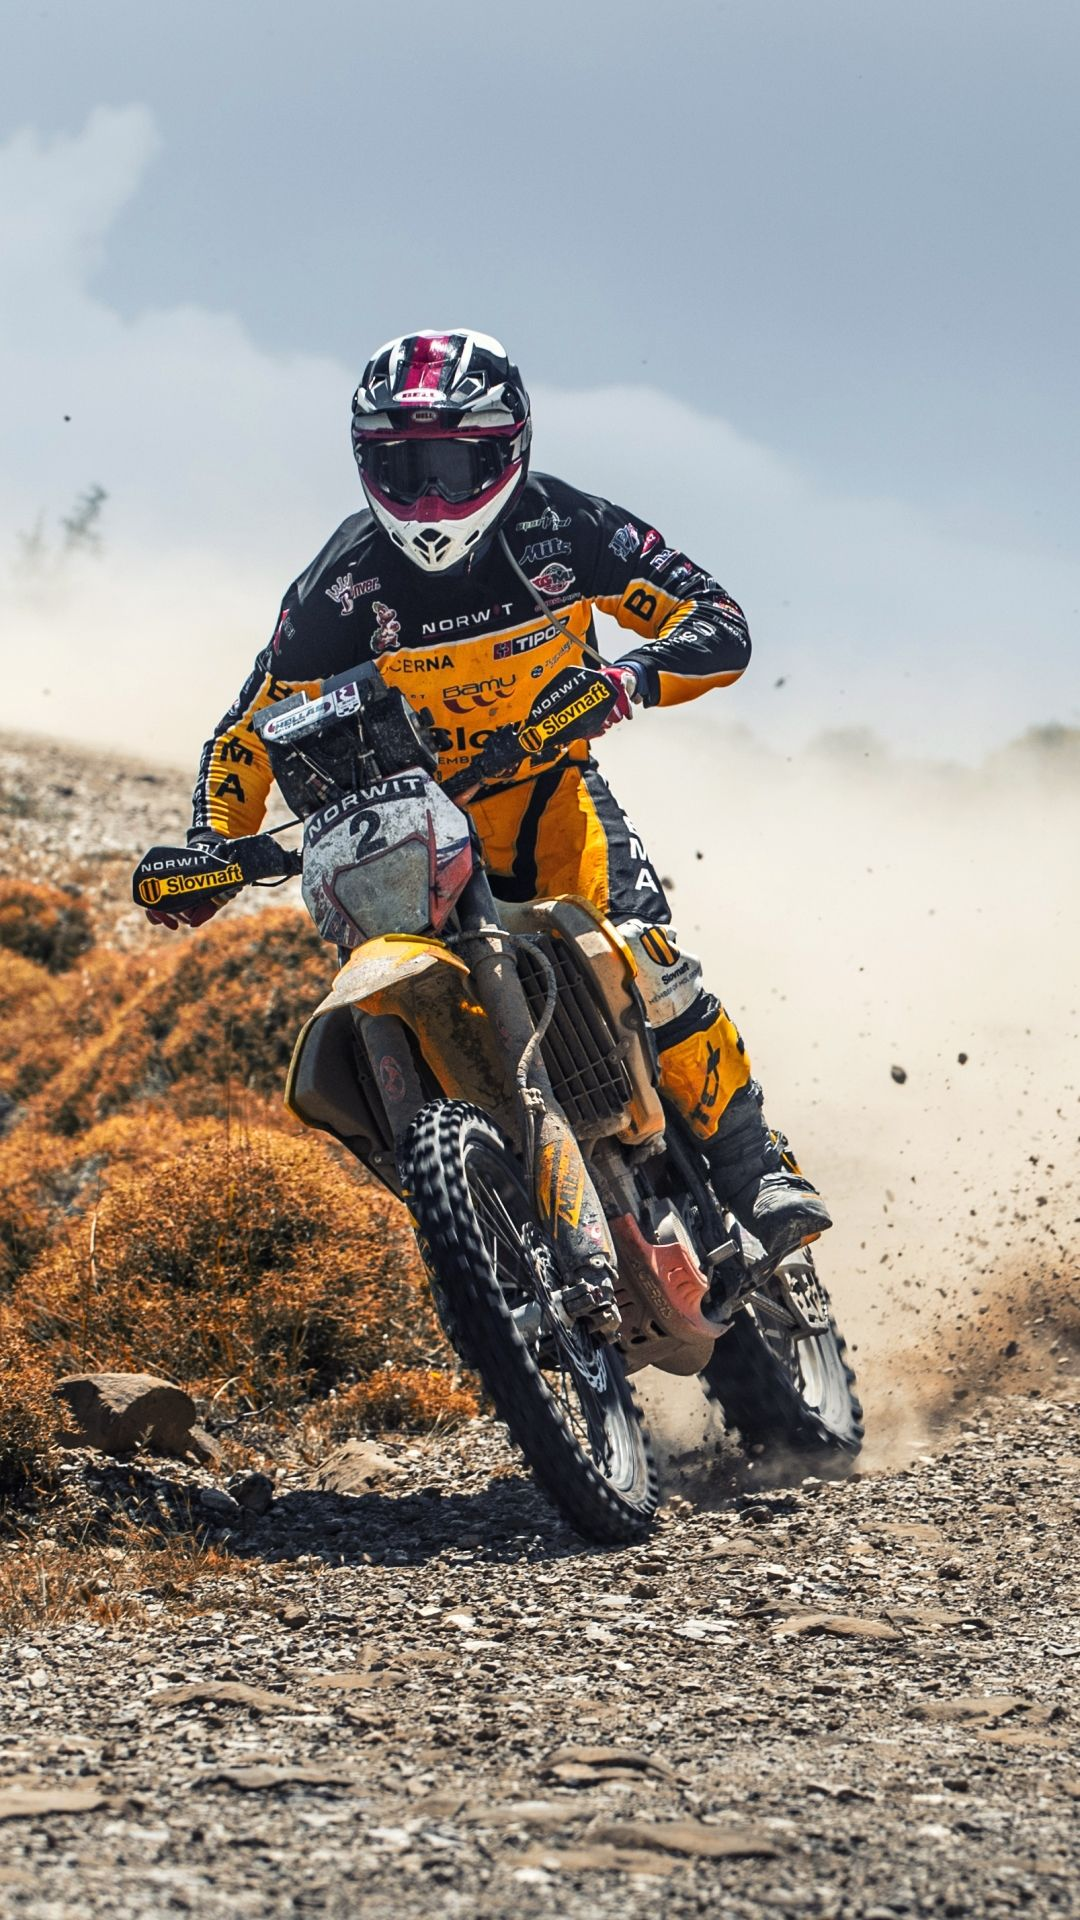 Sports Motocross 1080x1920 Mobile Wallpaper Motorcross Bike Womens Dirt Bike Gear Dirt Bikes